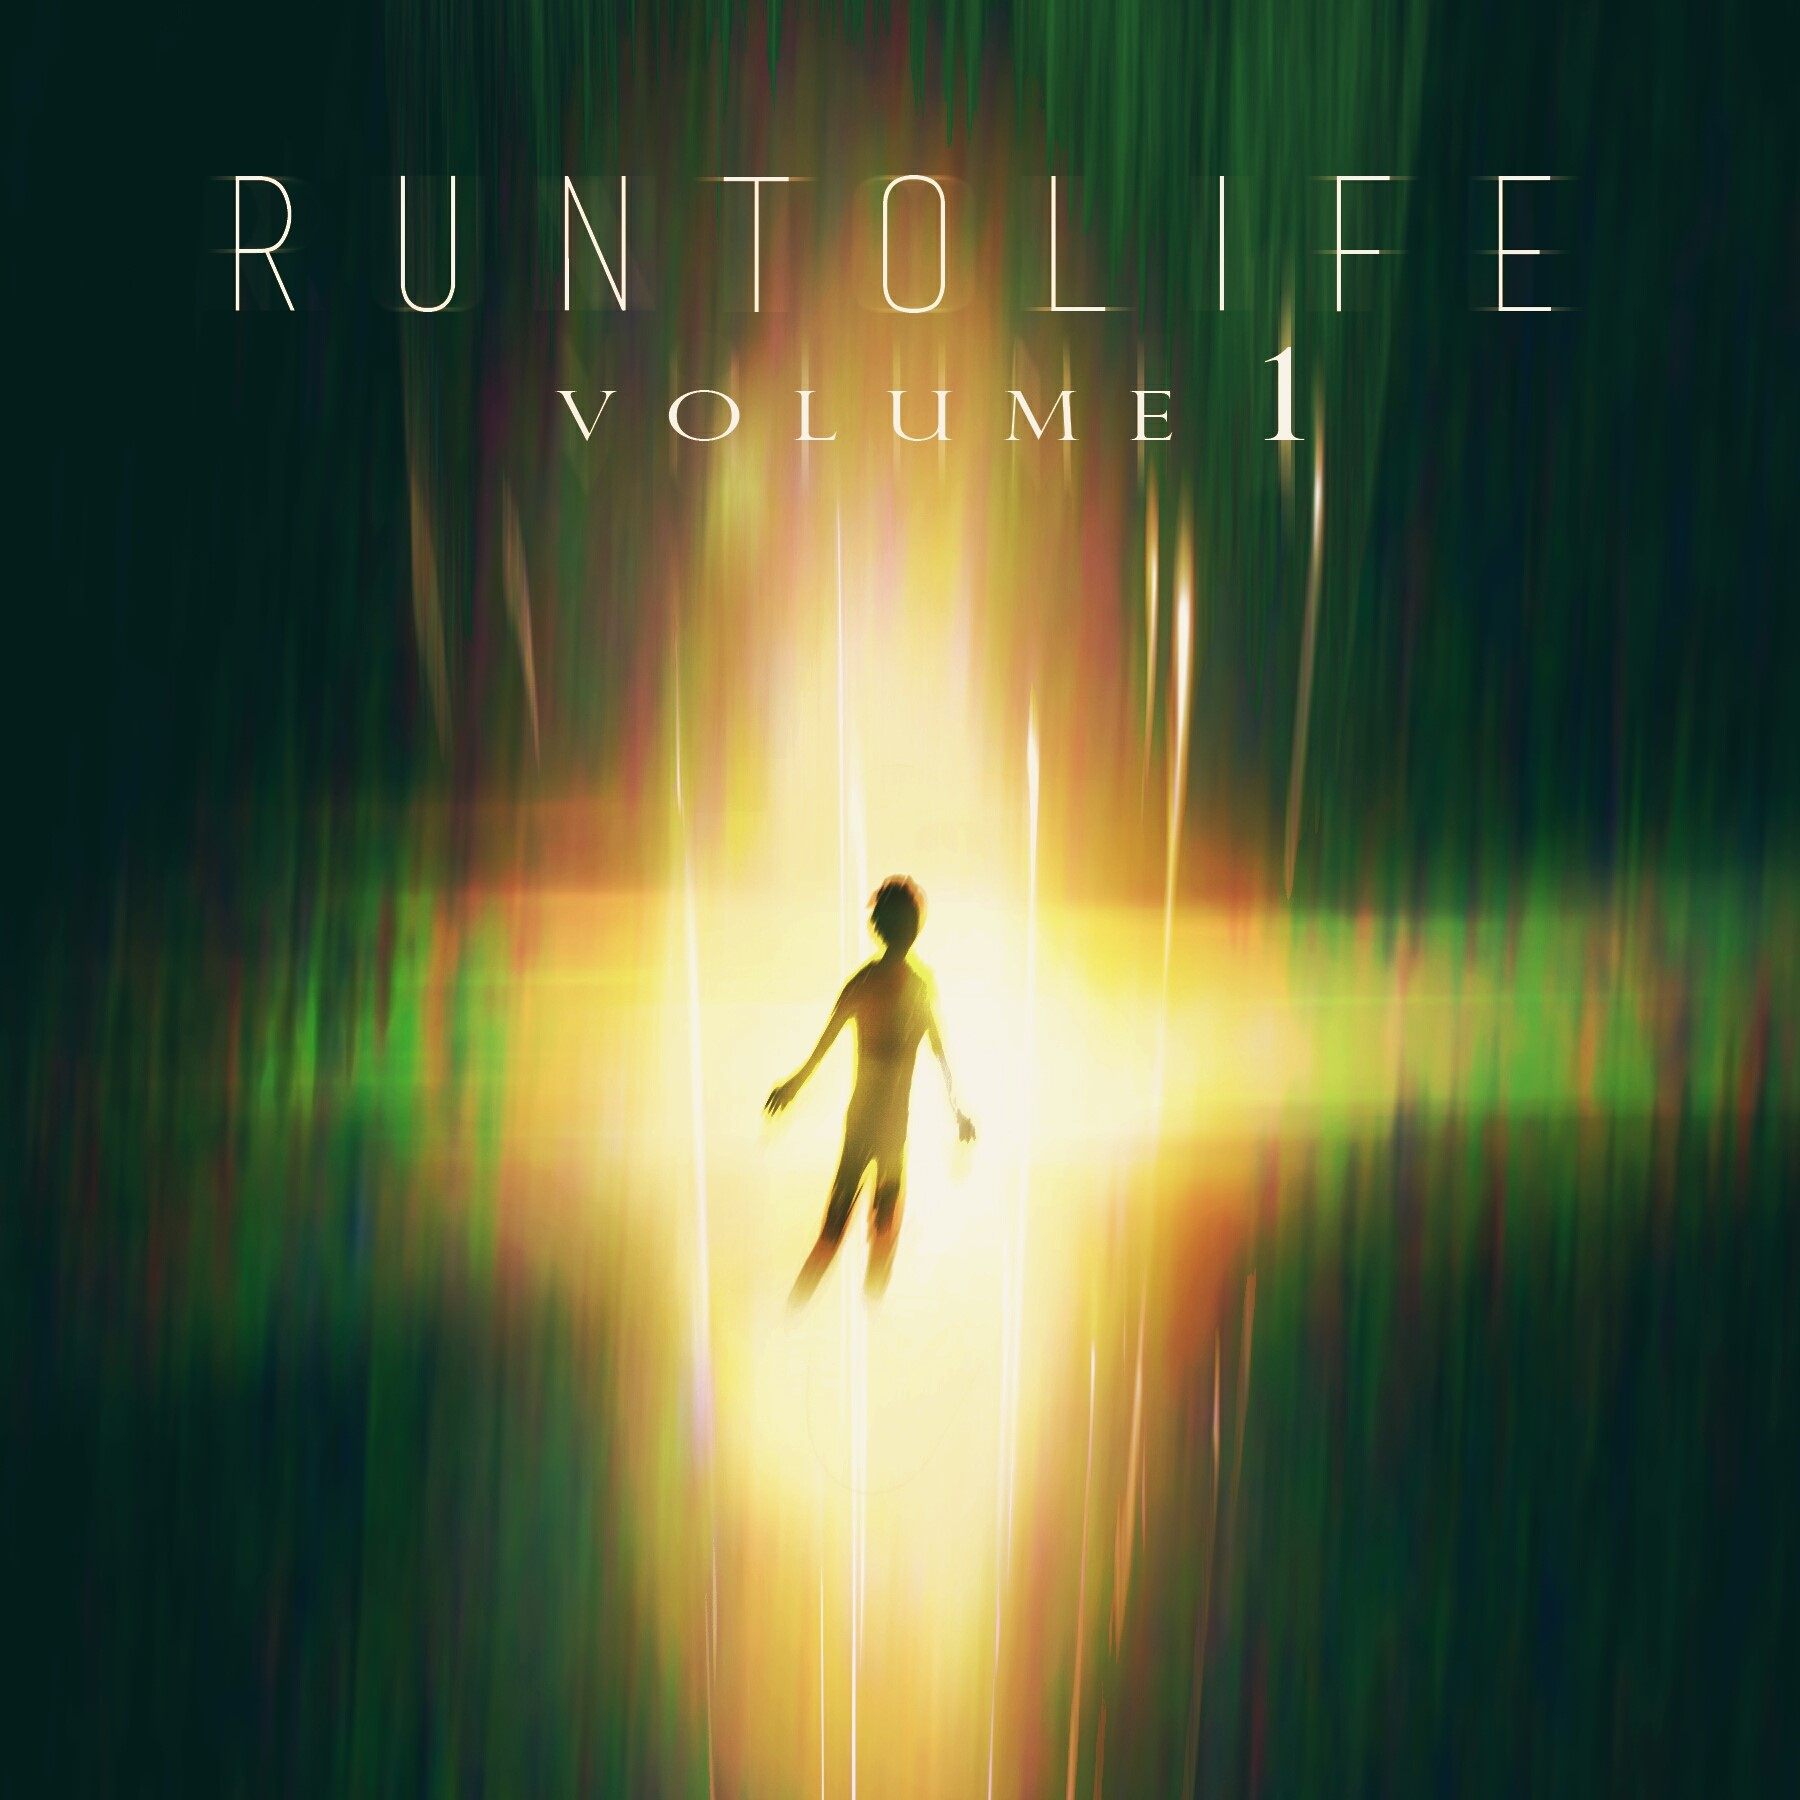 RUNTOLIFE Vol. II